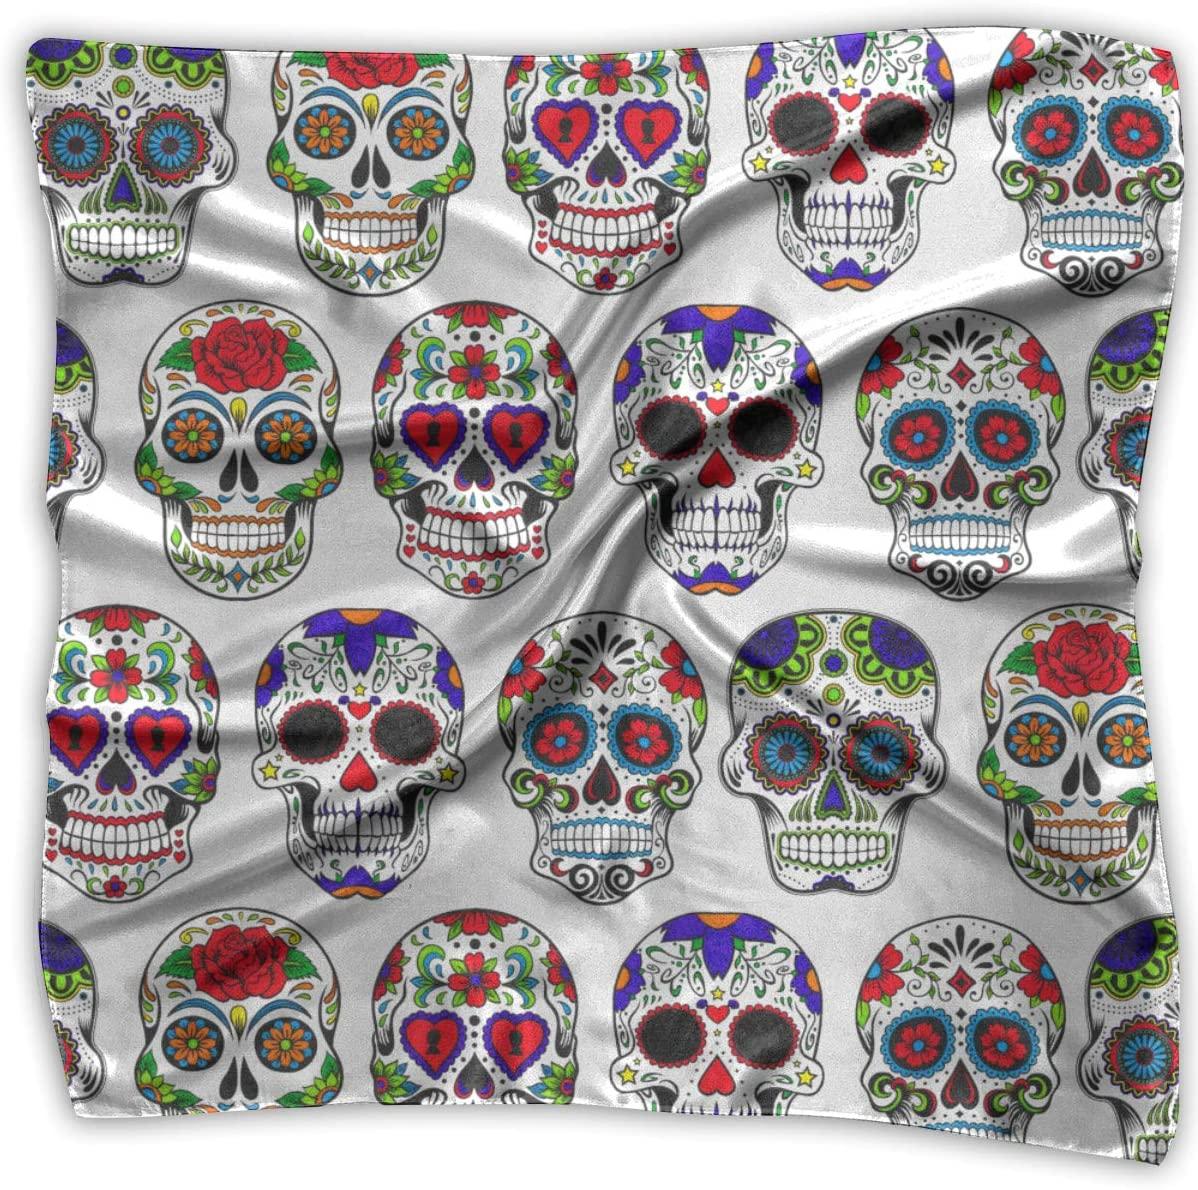 WFIRE Day of The Dead Sugar Skull Flower Art Square Handkerchiefs Scarf Shawl Bandanas Headscarf Neckerchief